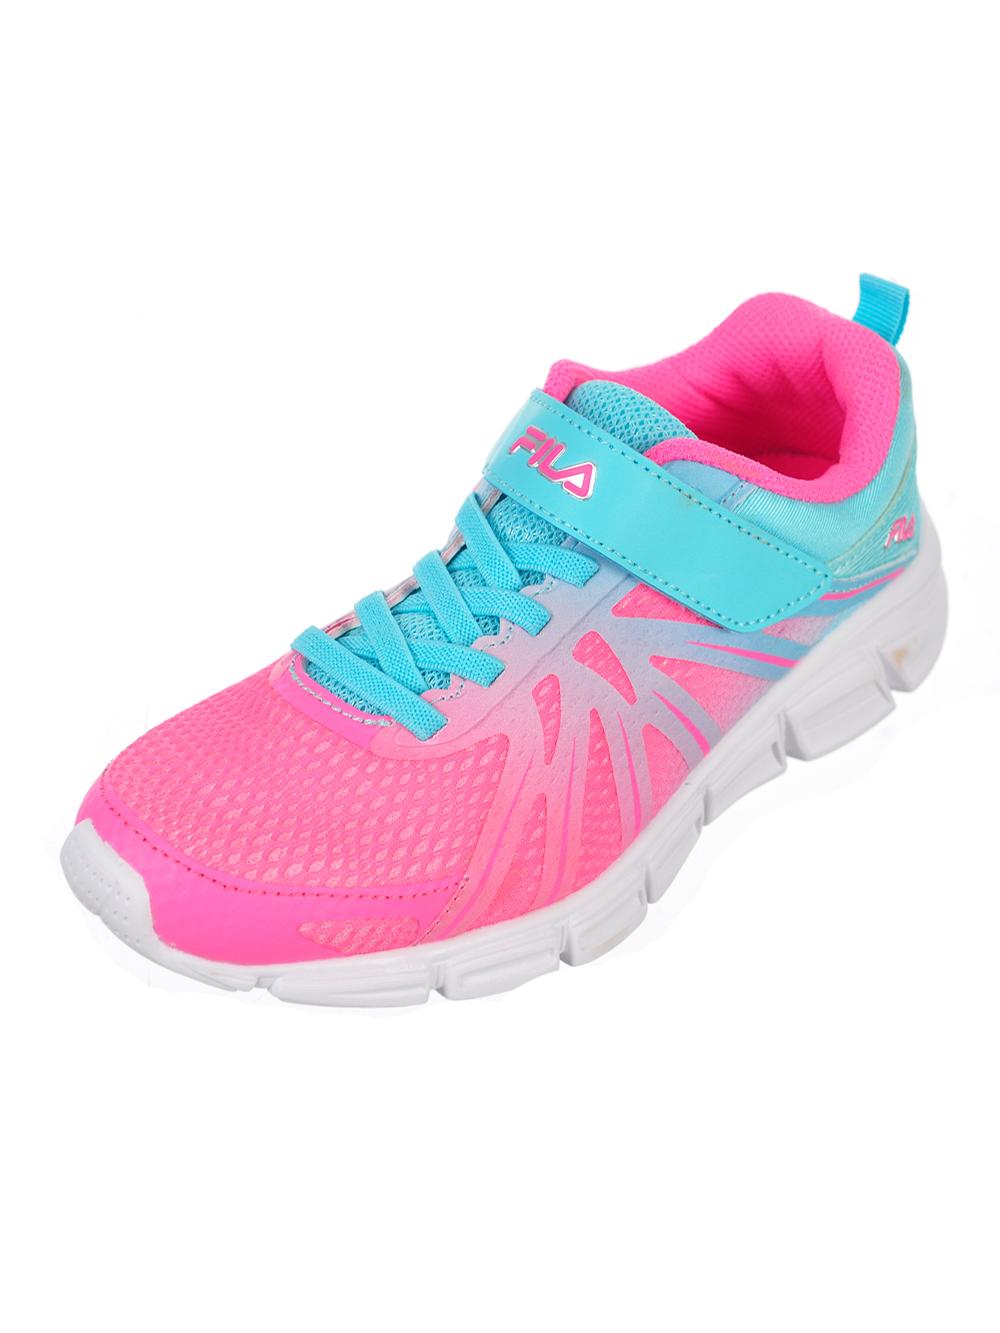 96abbf88 Fila Girls' Fraction Sneakers (Sizes 1 – 4)